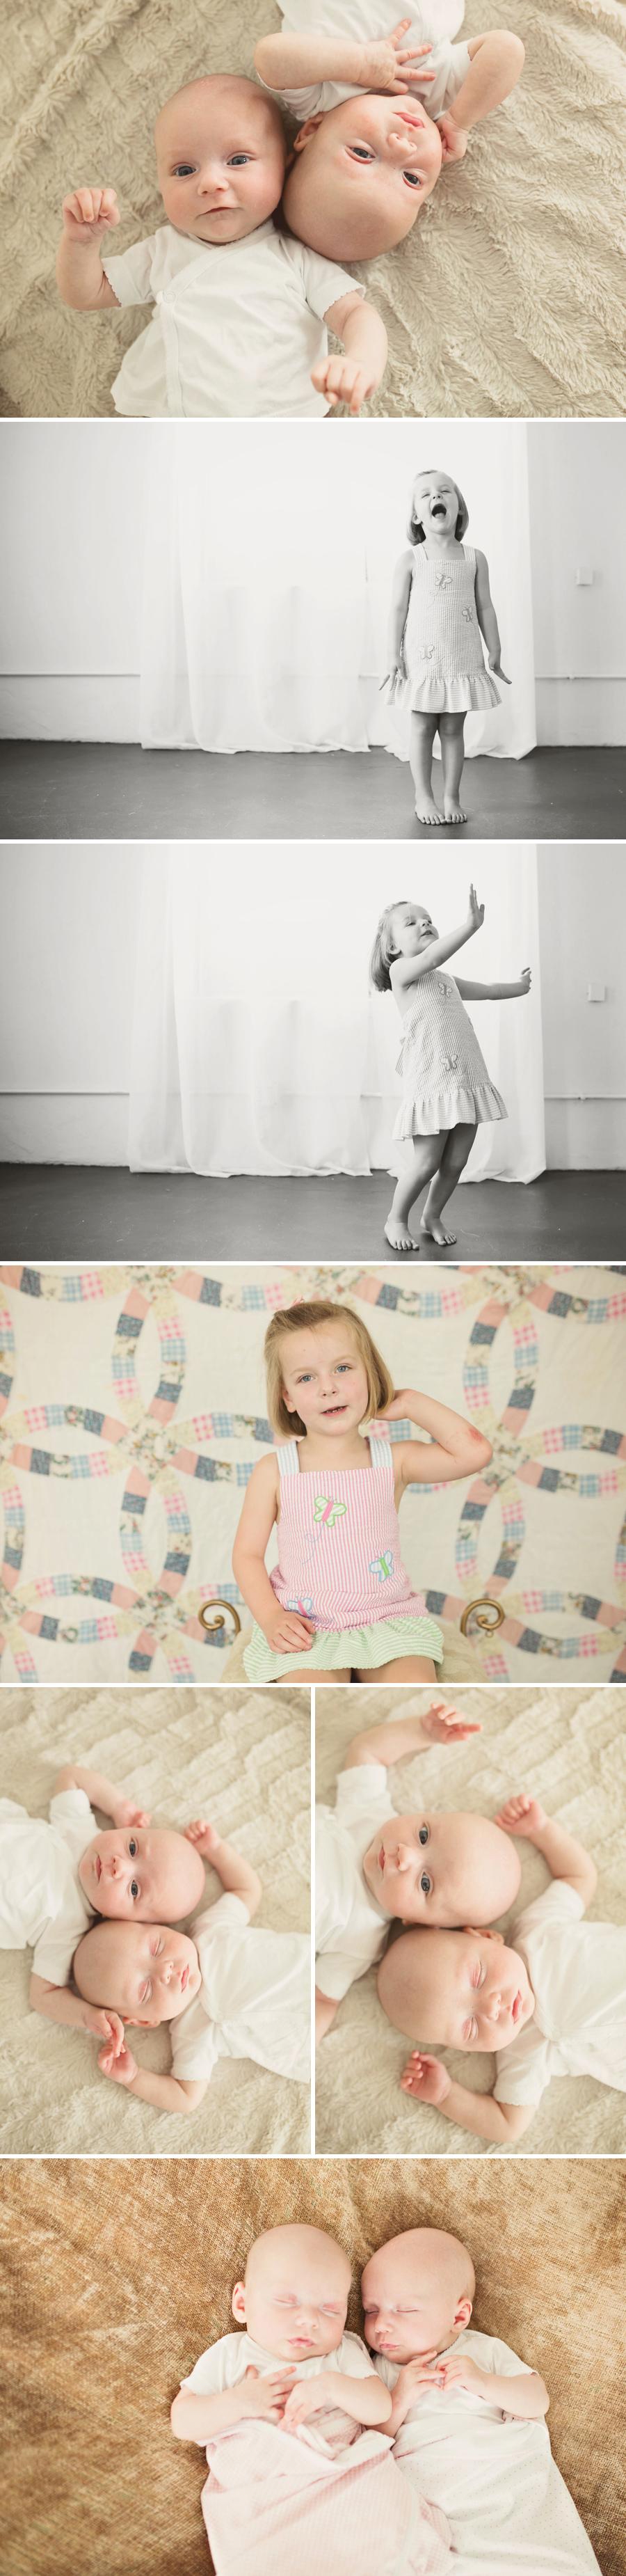 Dallas-Baby-Photographercomp006